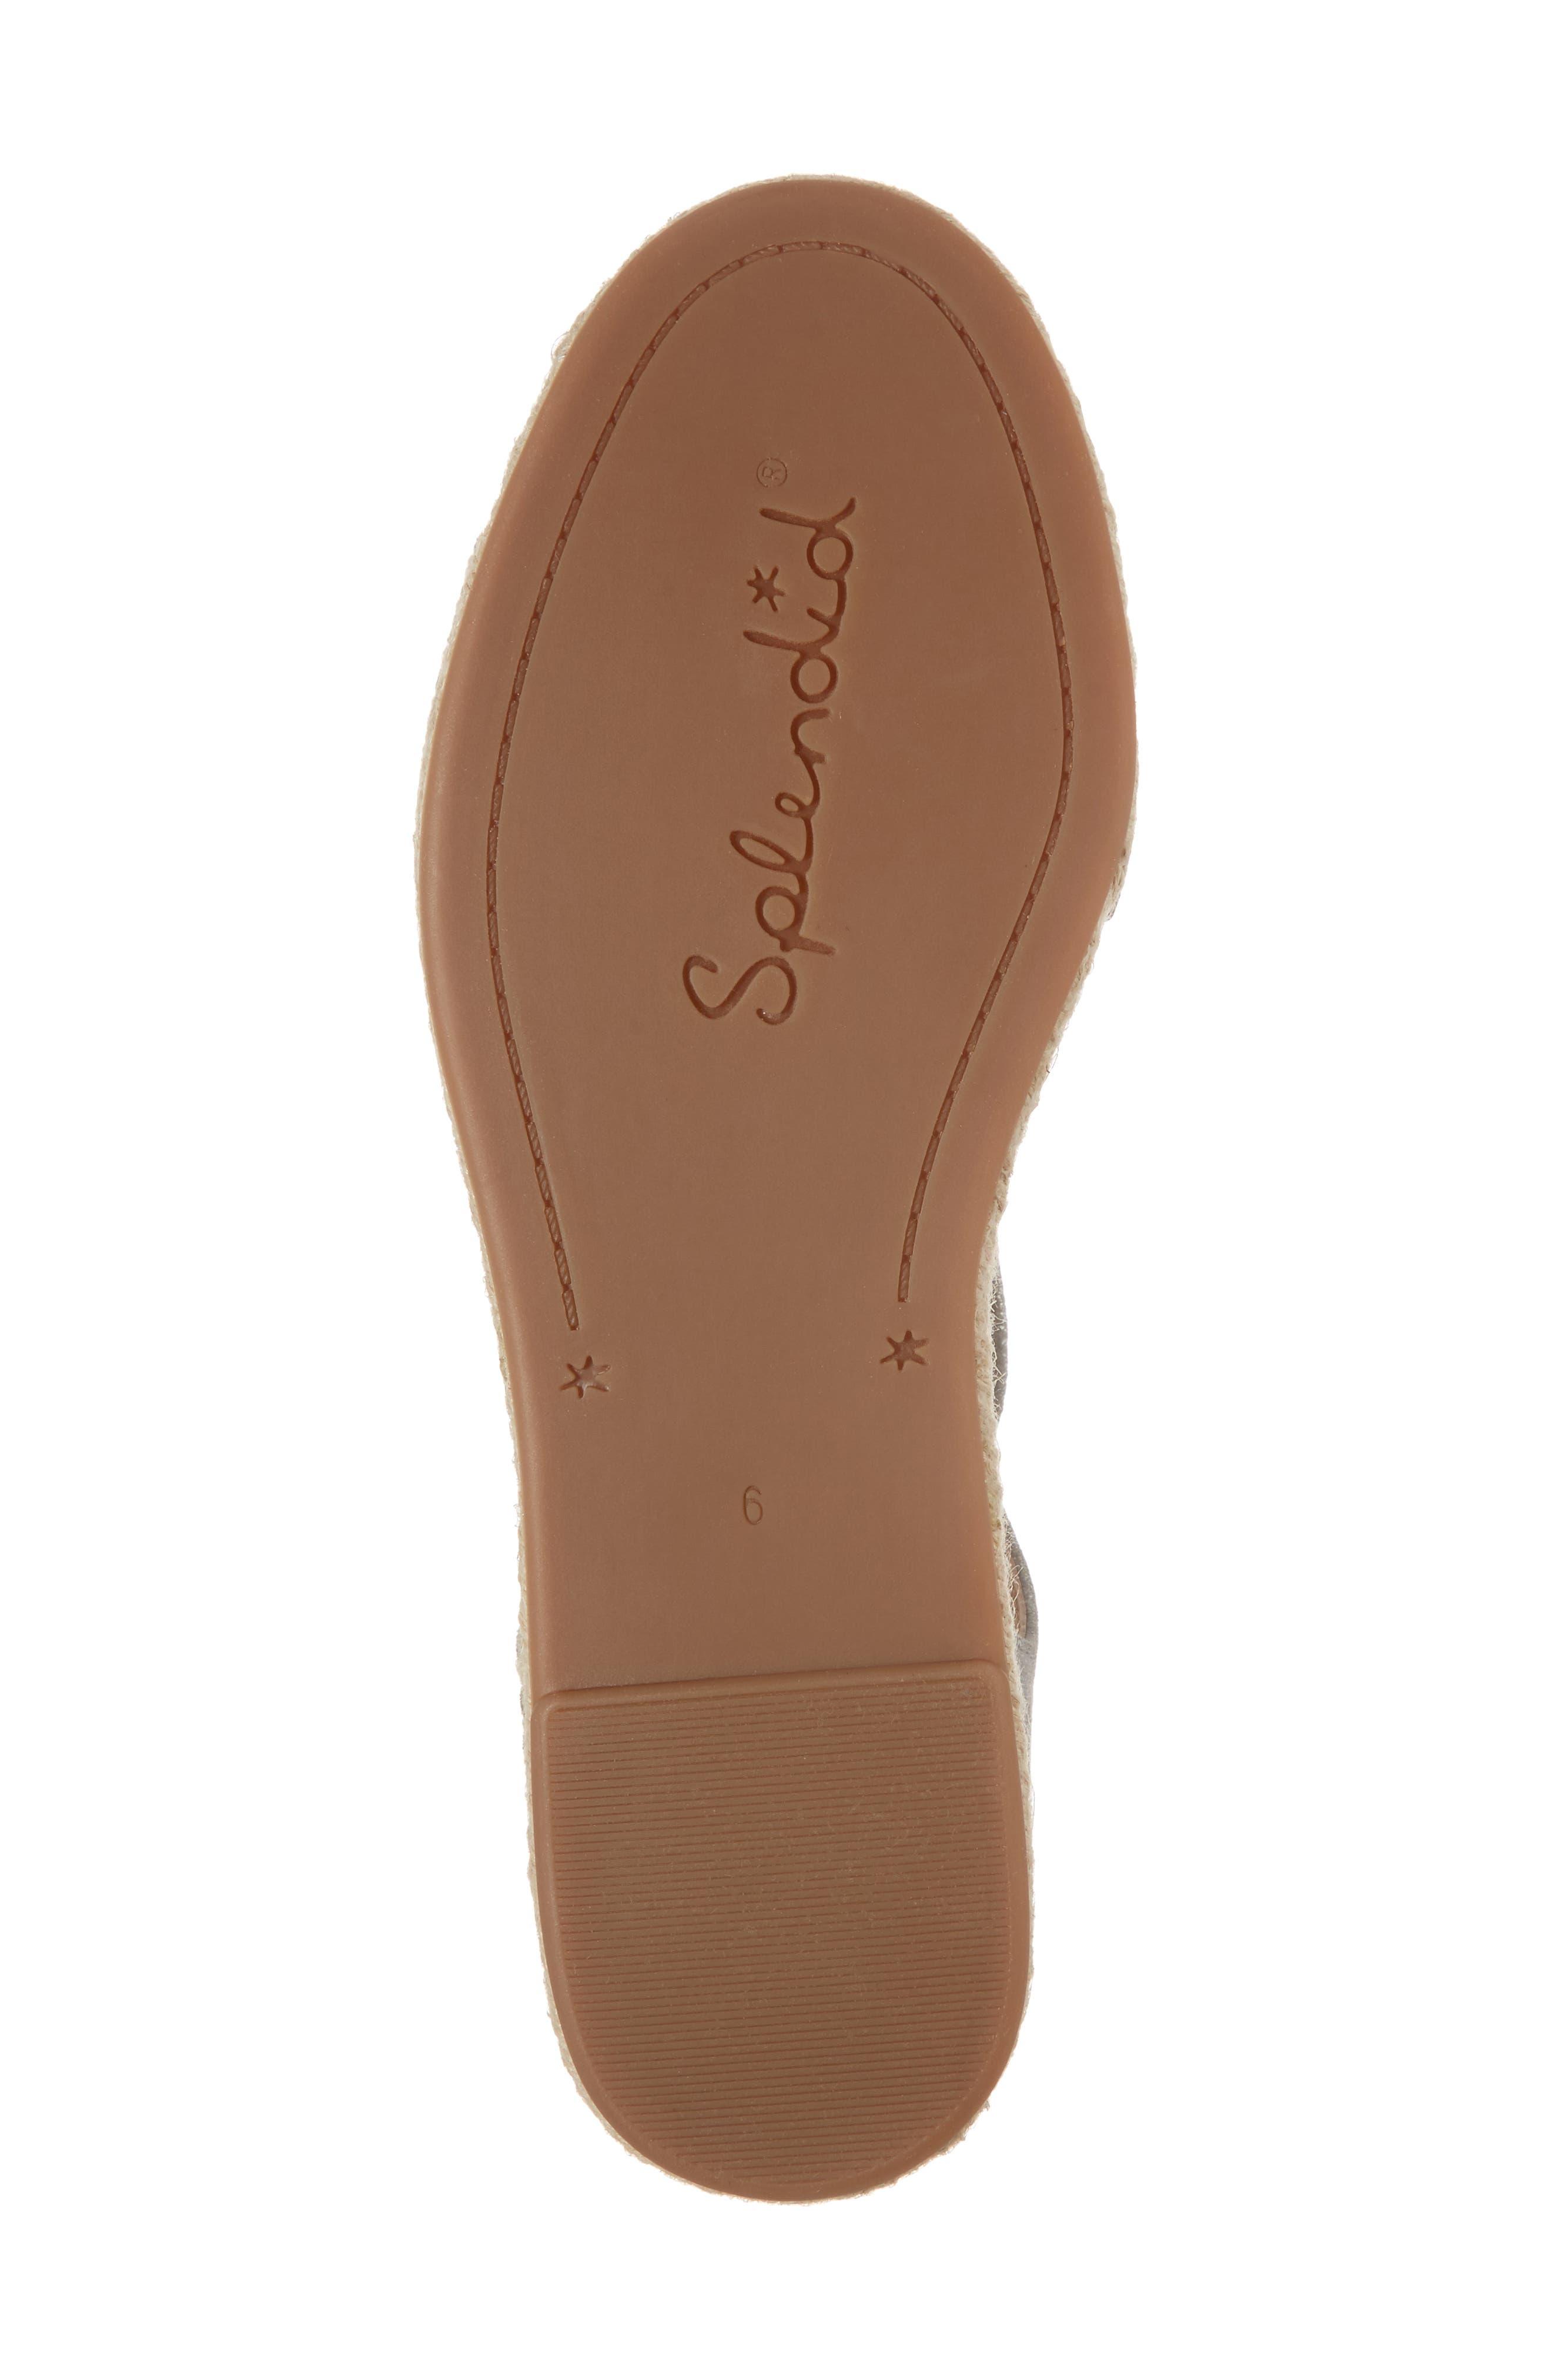 Fernanda Wraparound Platform Sandal,                             Alternate thumbnail 6, color,                             SILVER SUEDE